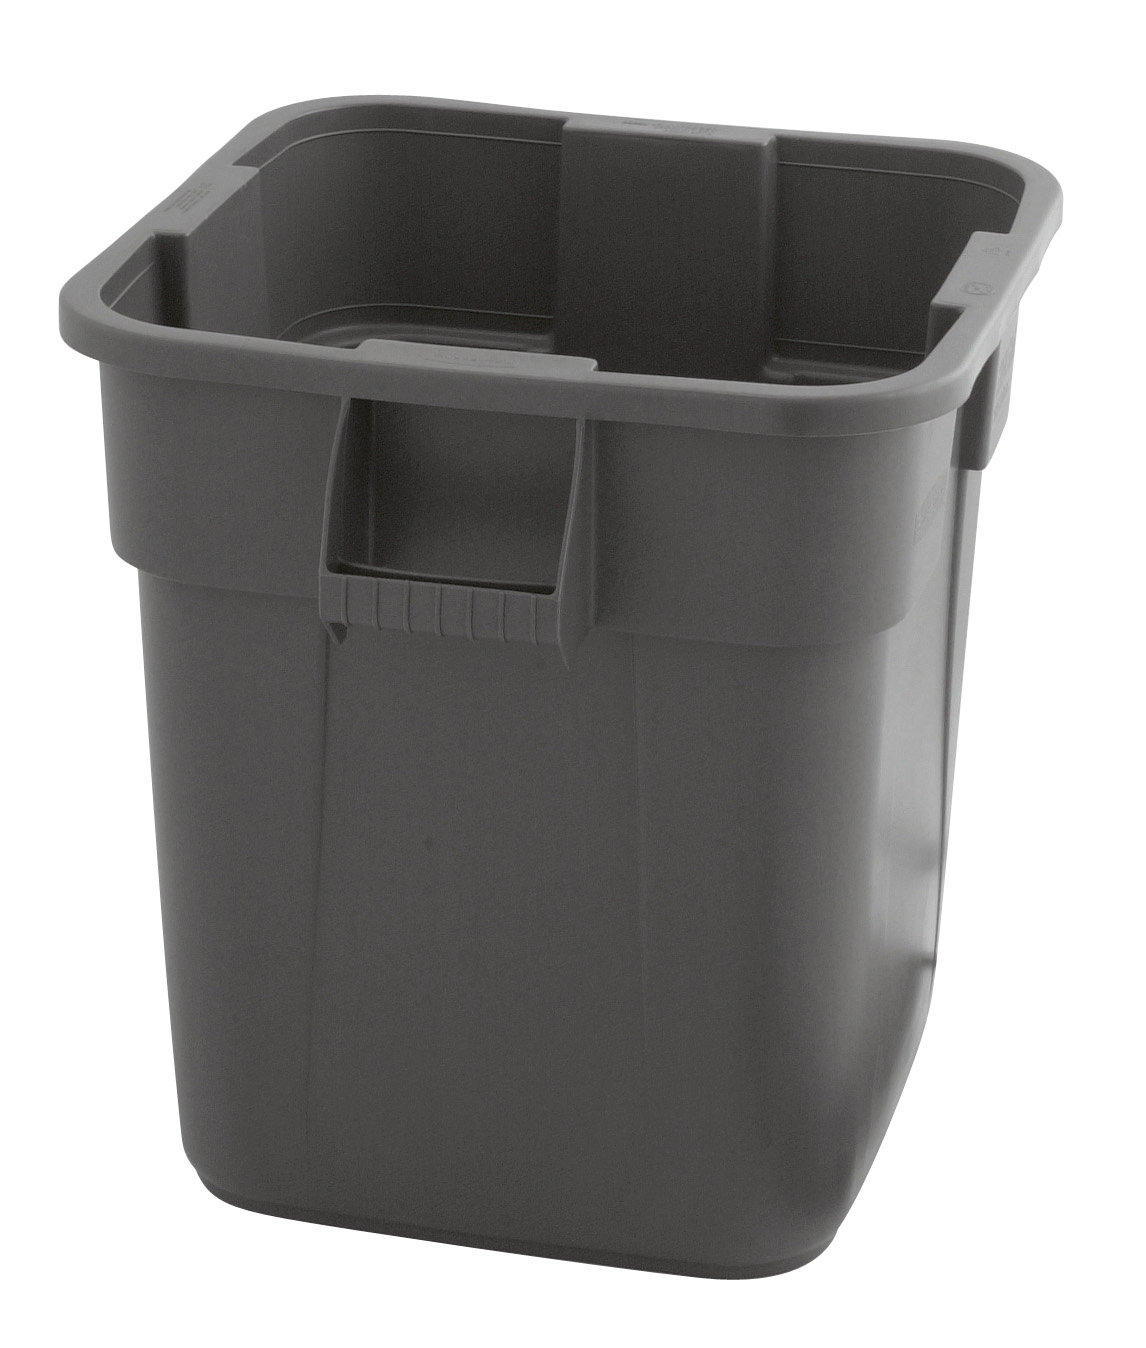 Rubbermaid Vierkante Brute container 151,1 ltr, Grijs (VB003536G)